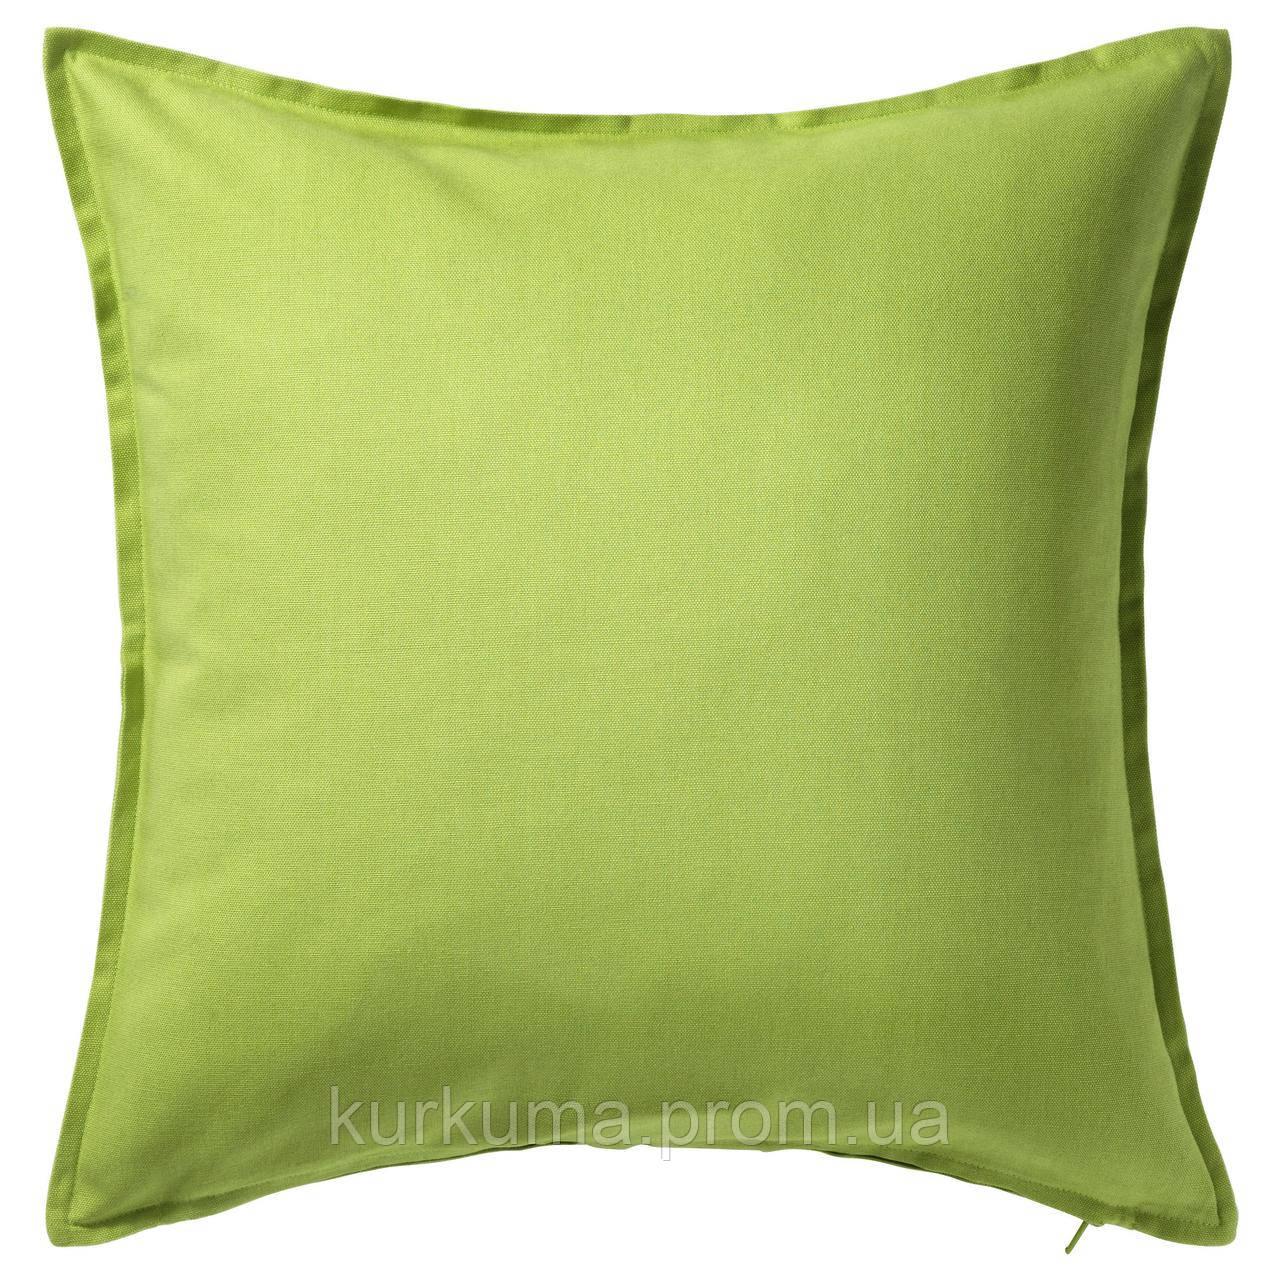 IKEA GURLI Наволочка на декоративную подушку, зеленый  (002.811.42)